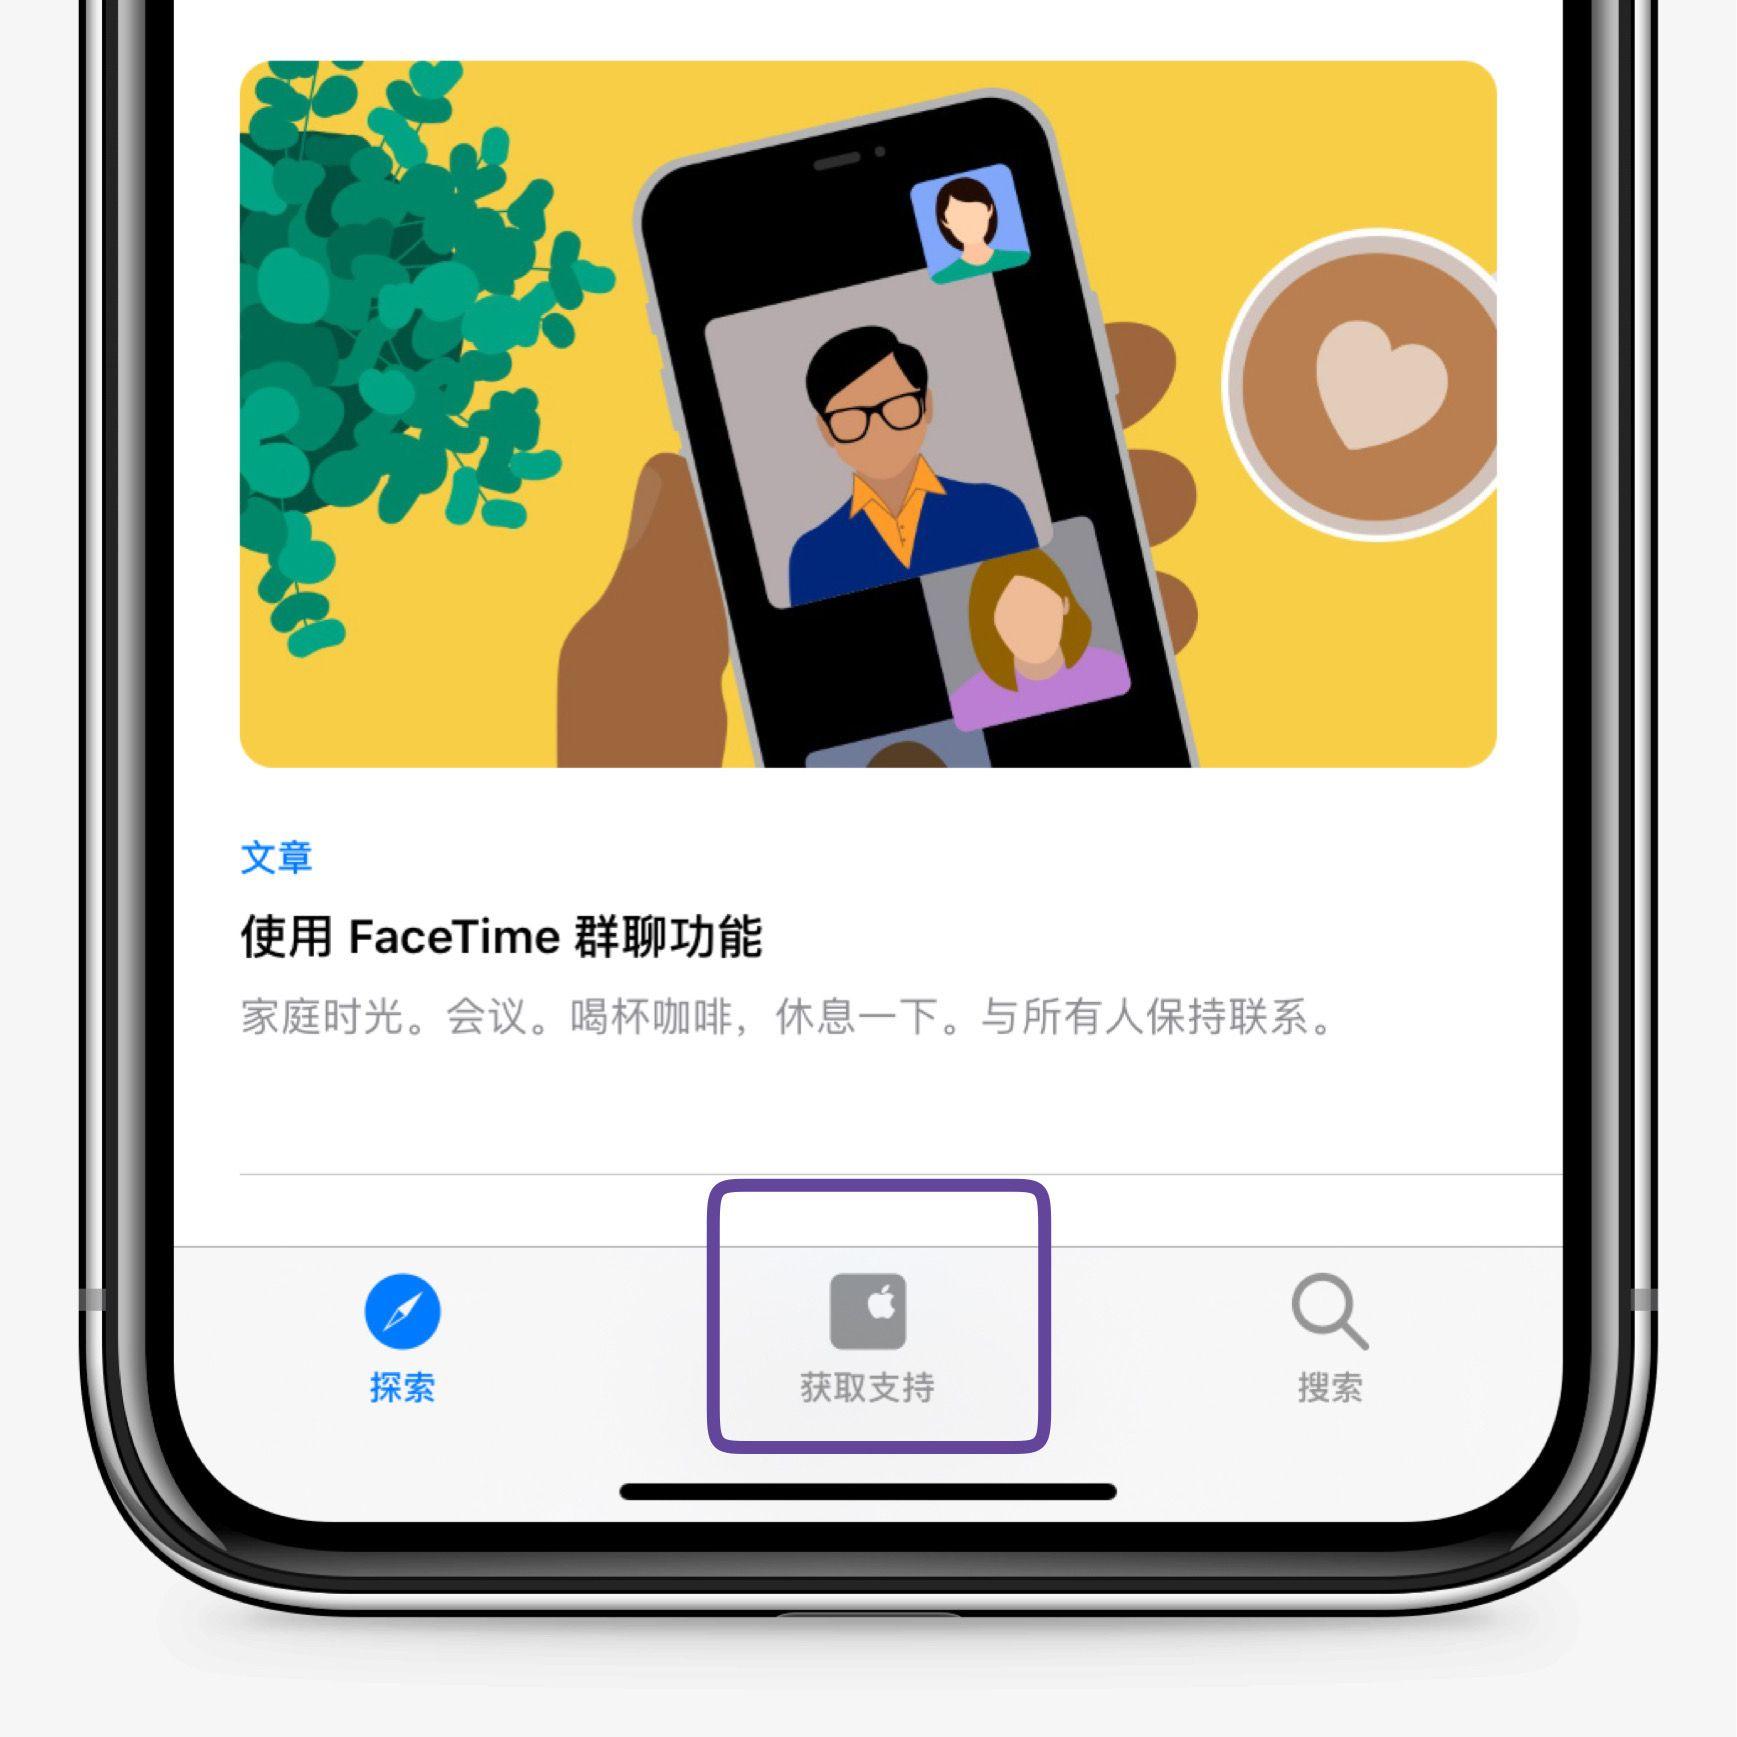 iPhone乱扣费解决方法-钟意博客文章